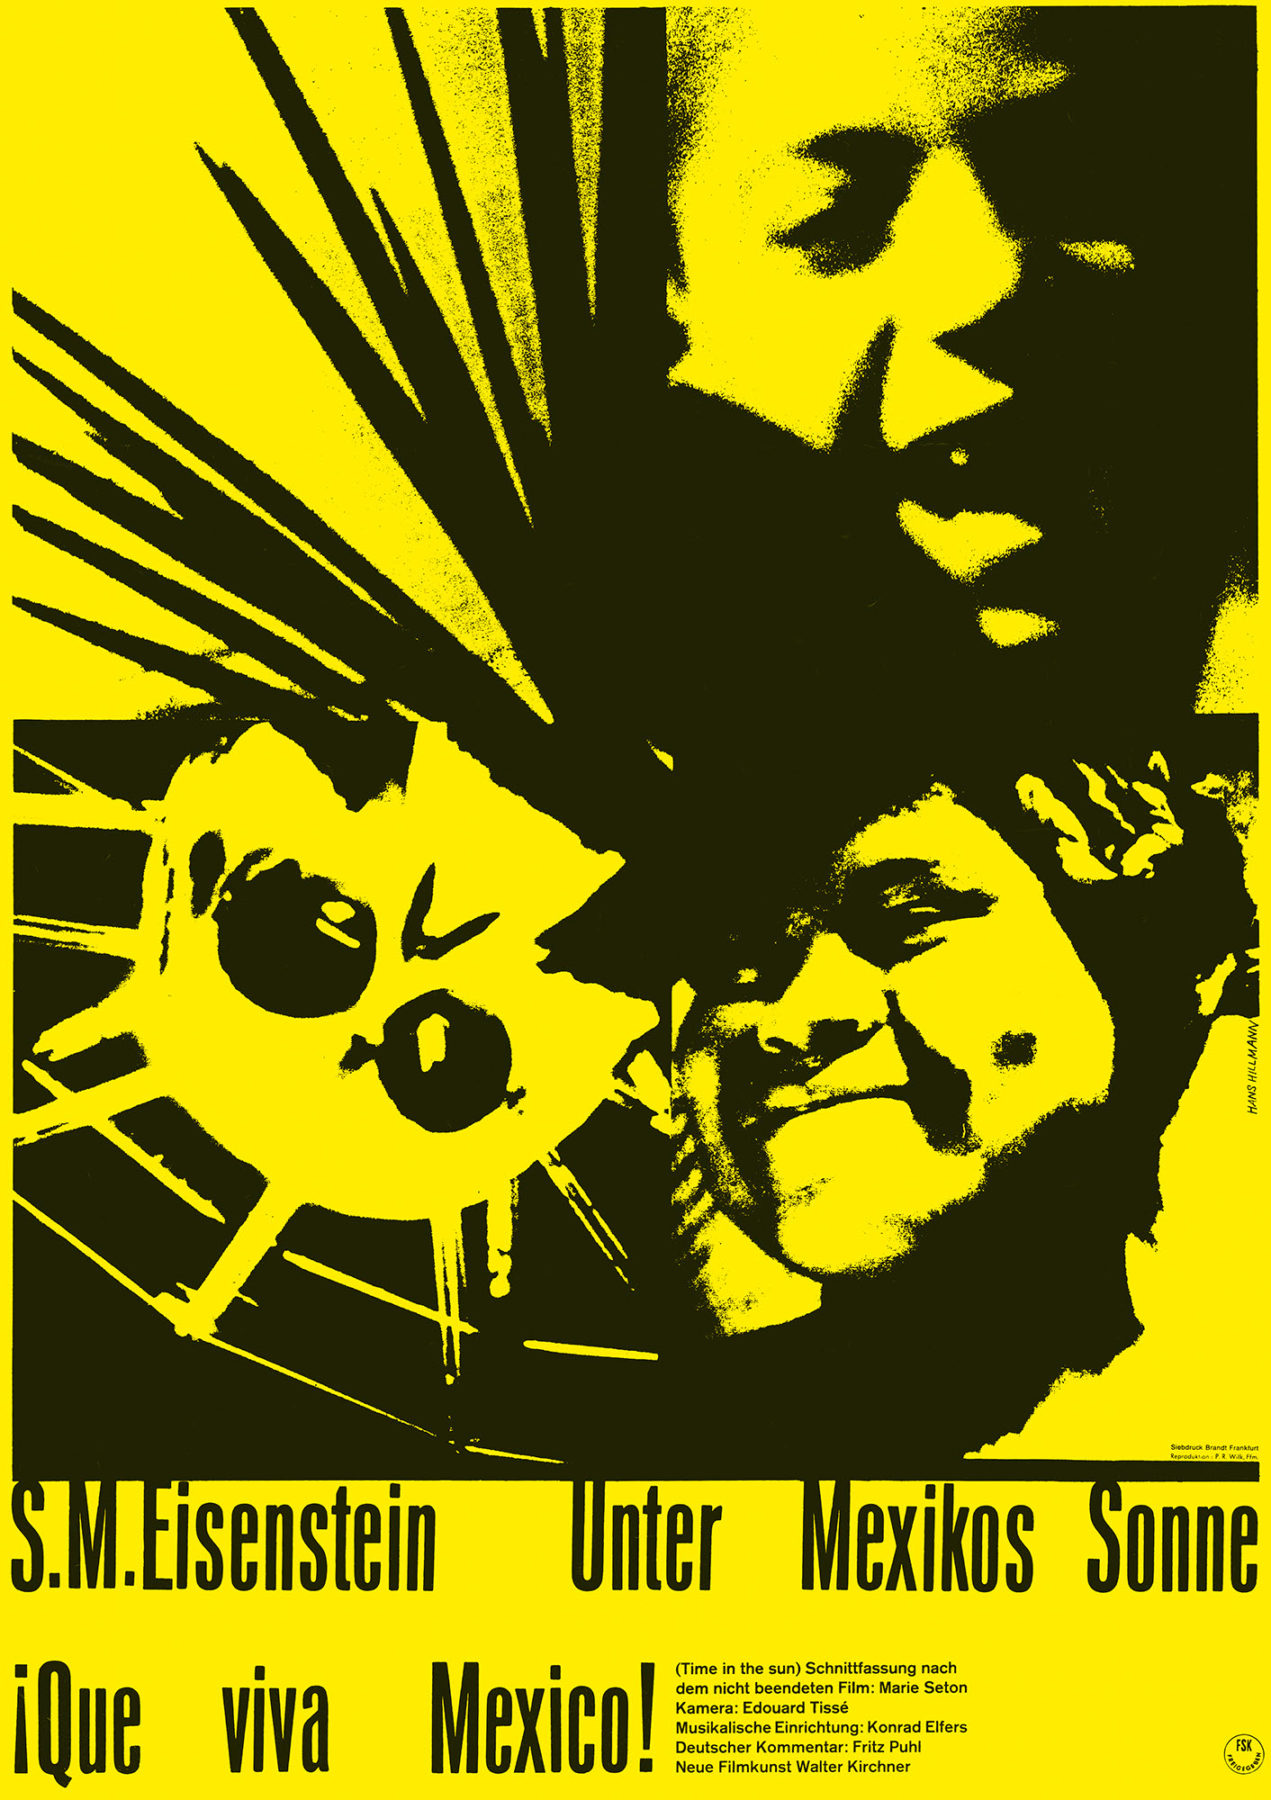 Hillmann 1963 Unter Mexikos Sonne Neue Filmkunst Walter Kirchner Plakat A1